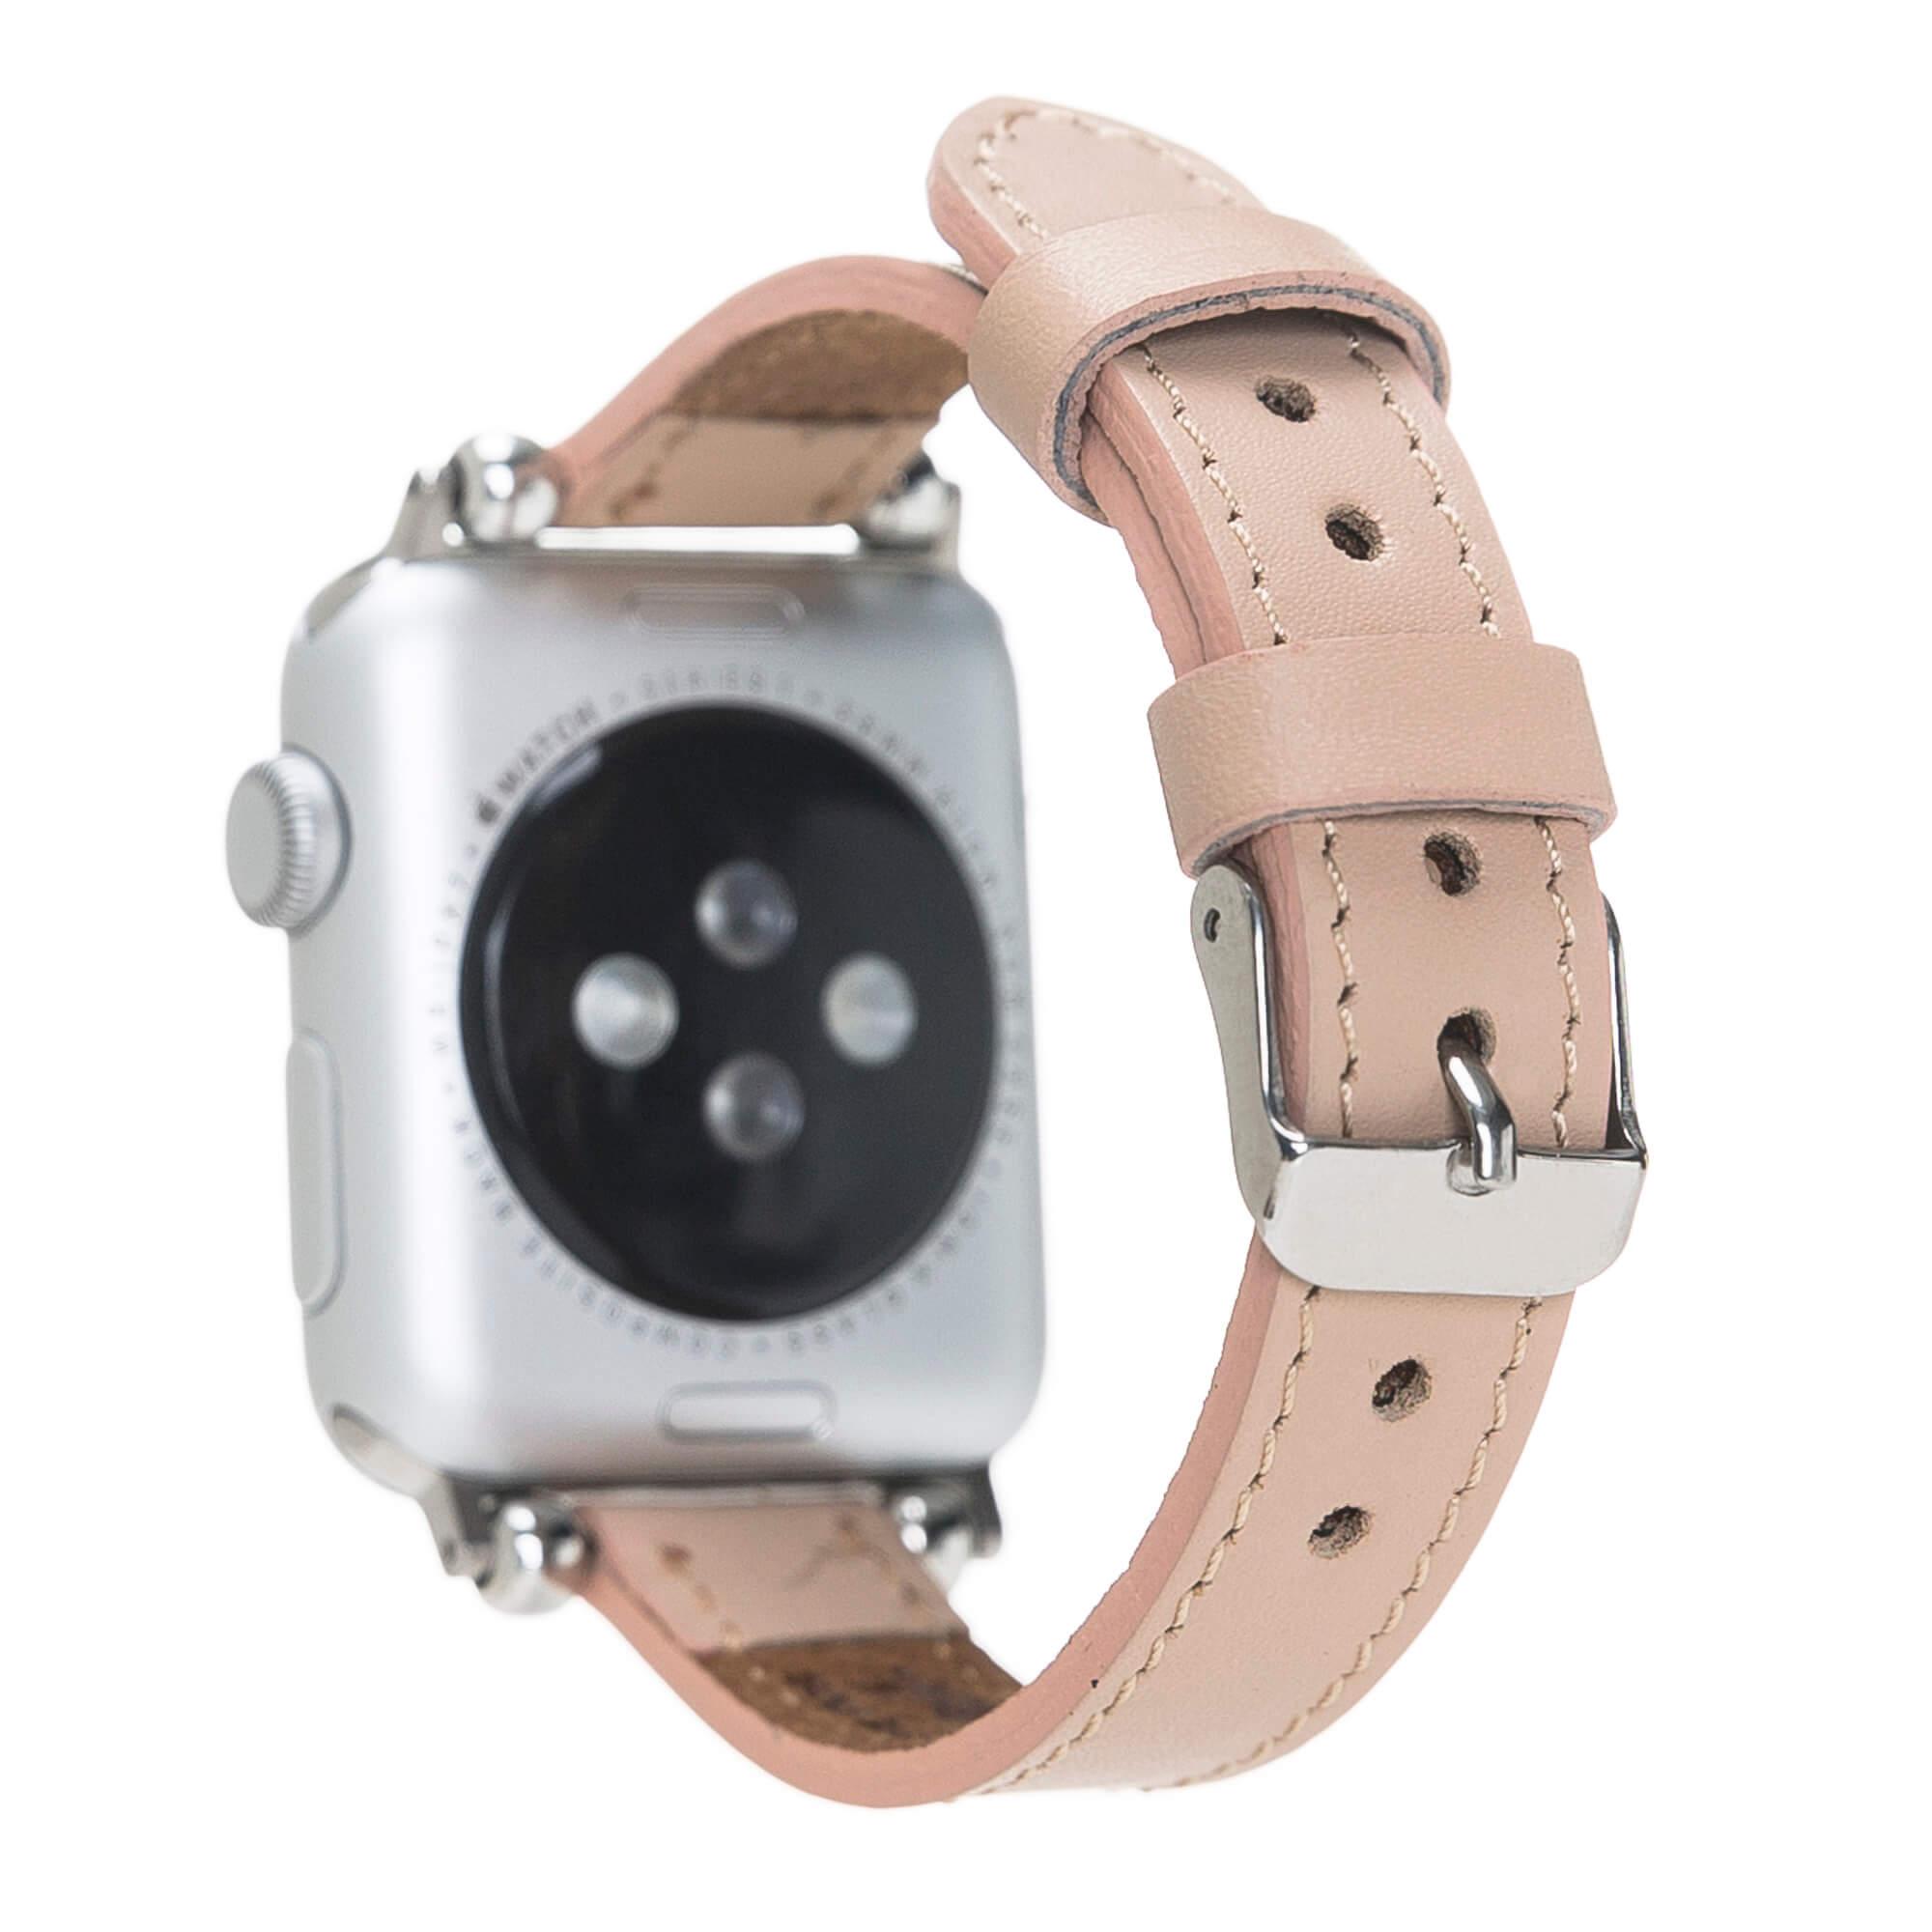 "Lederarmband ""Lady Slim"" für das Apple Watch Series 1-6 + SE in 38/40mm Cognac Braun Burned"